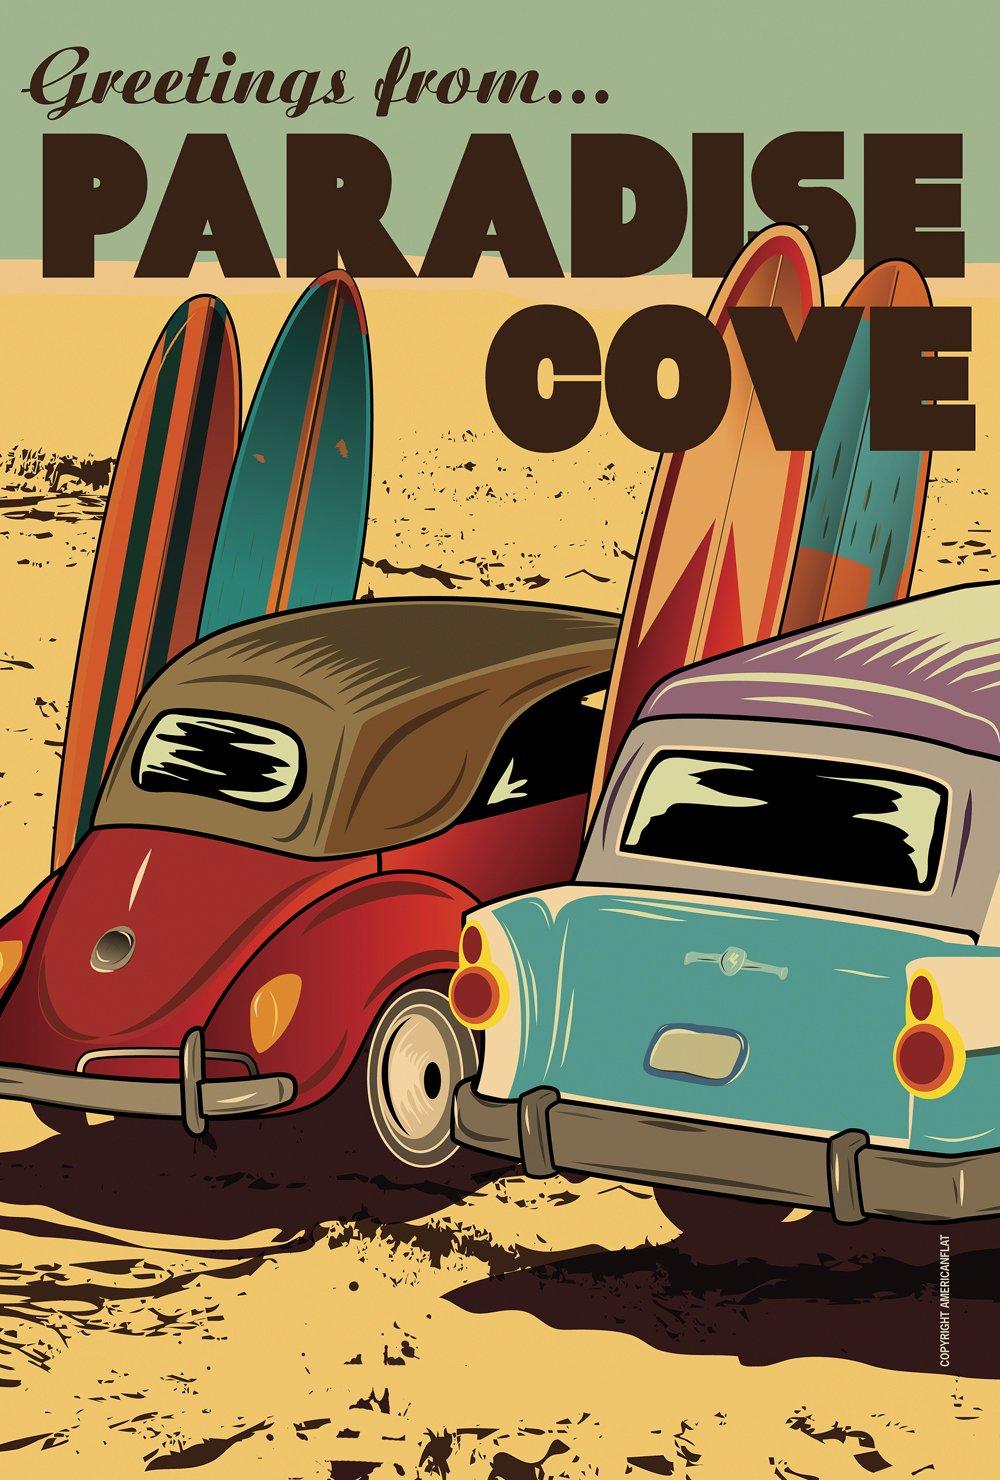 Toland Home Garden Surf Paradise Cove 28 x 40 Inch Decorative Vintage Summer Beach Car Surfboard House Flag